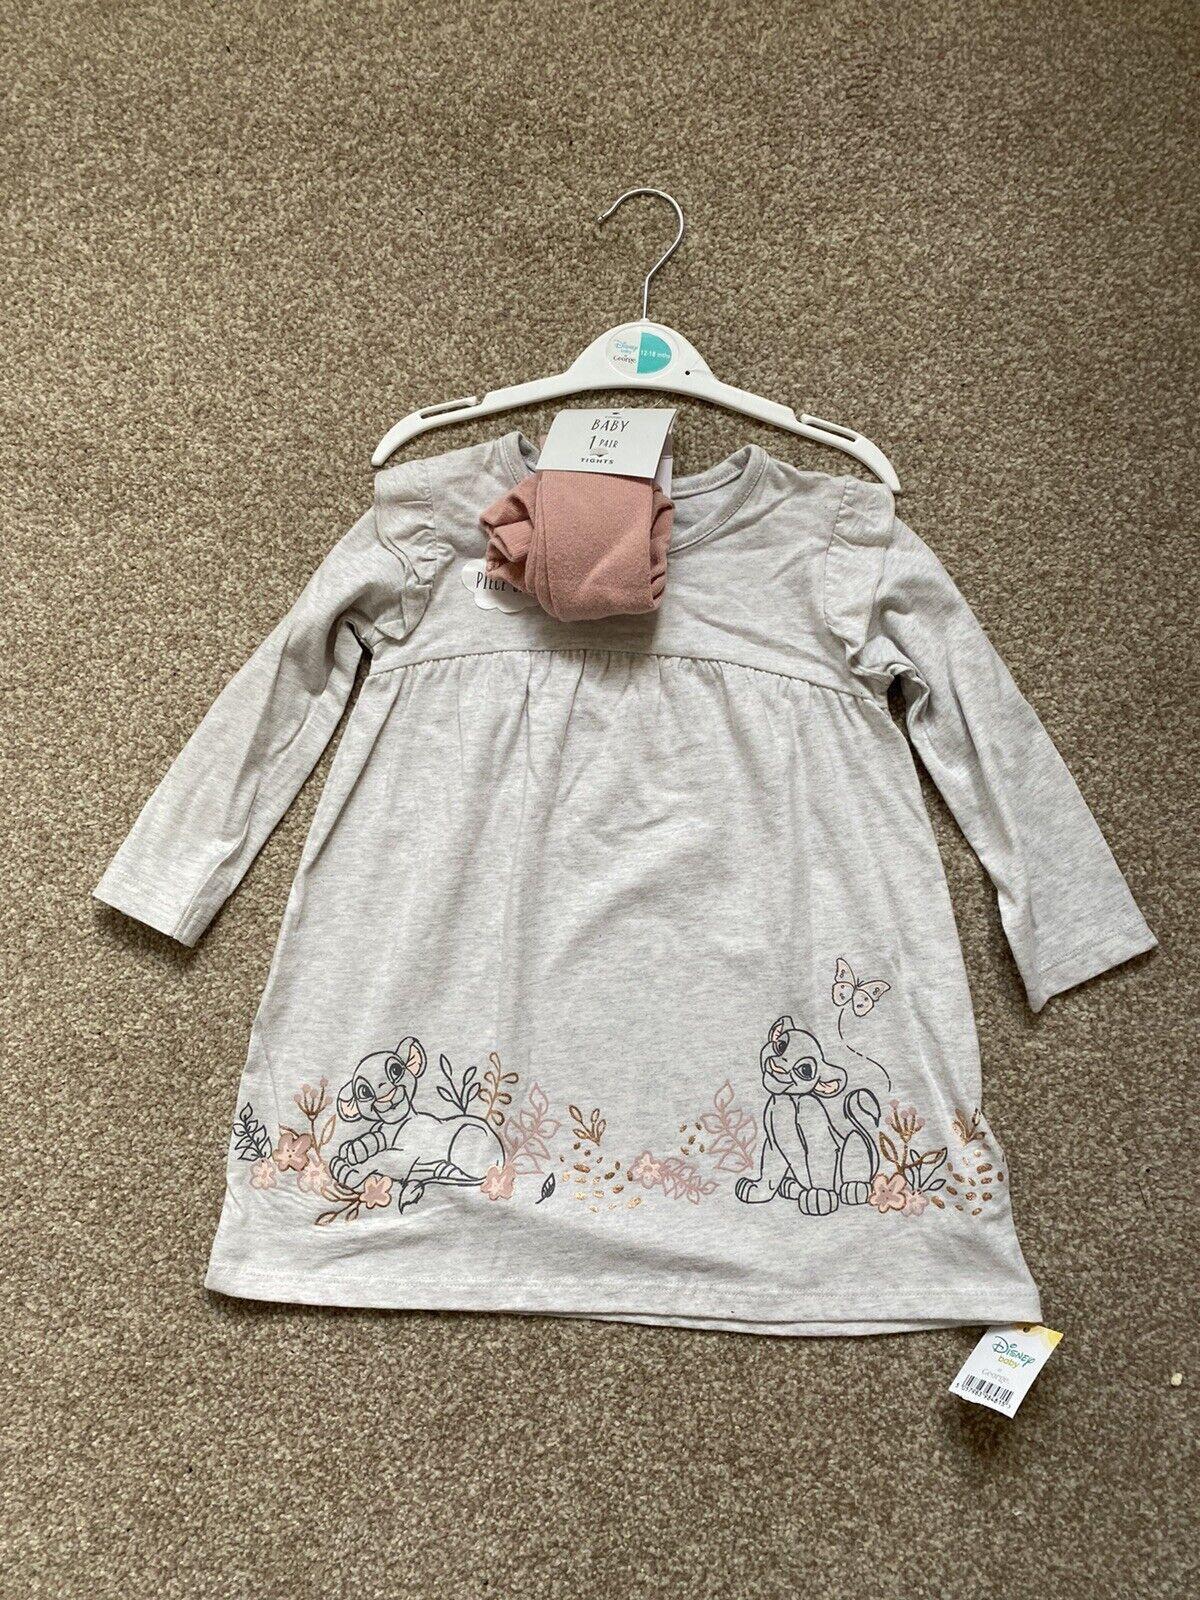 12-18 mths Niñas Vestido & Mallas Conjunto